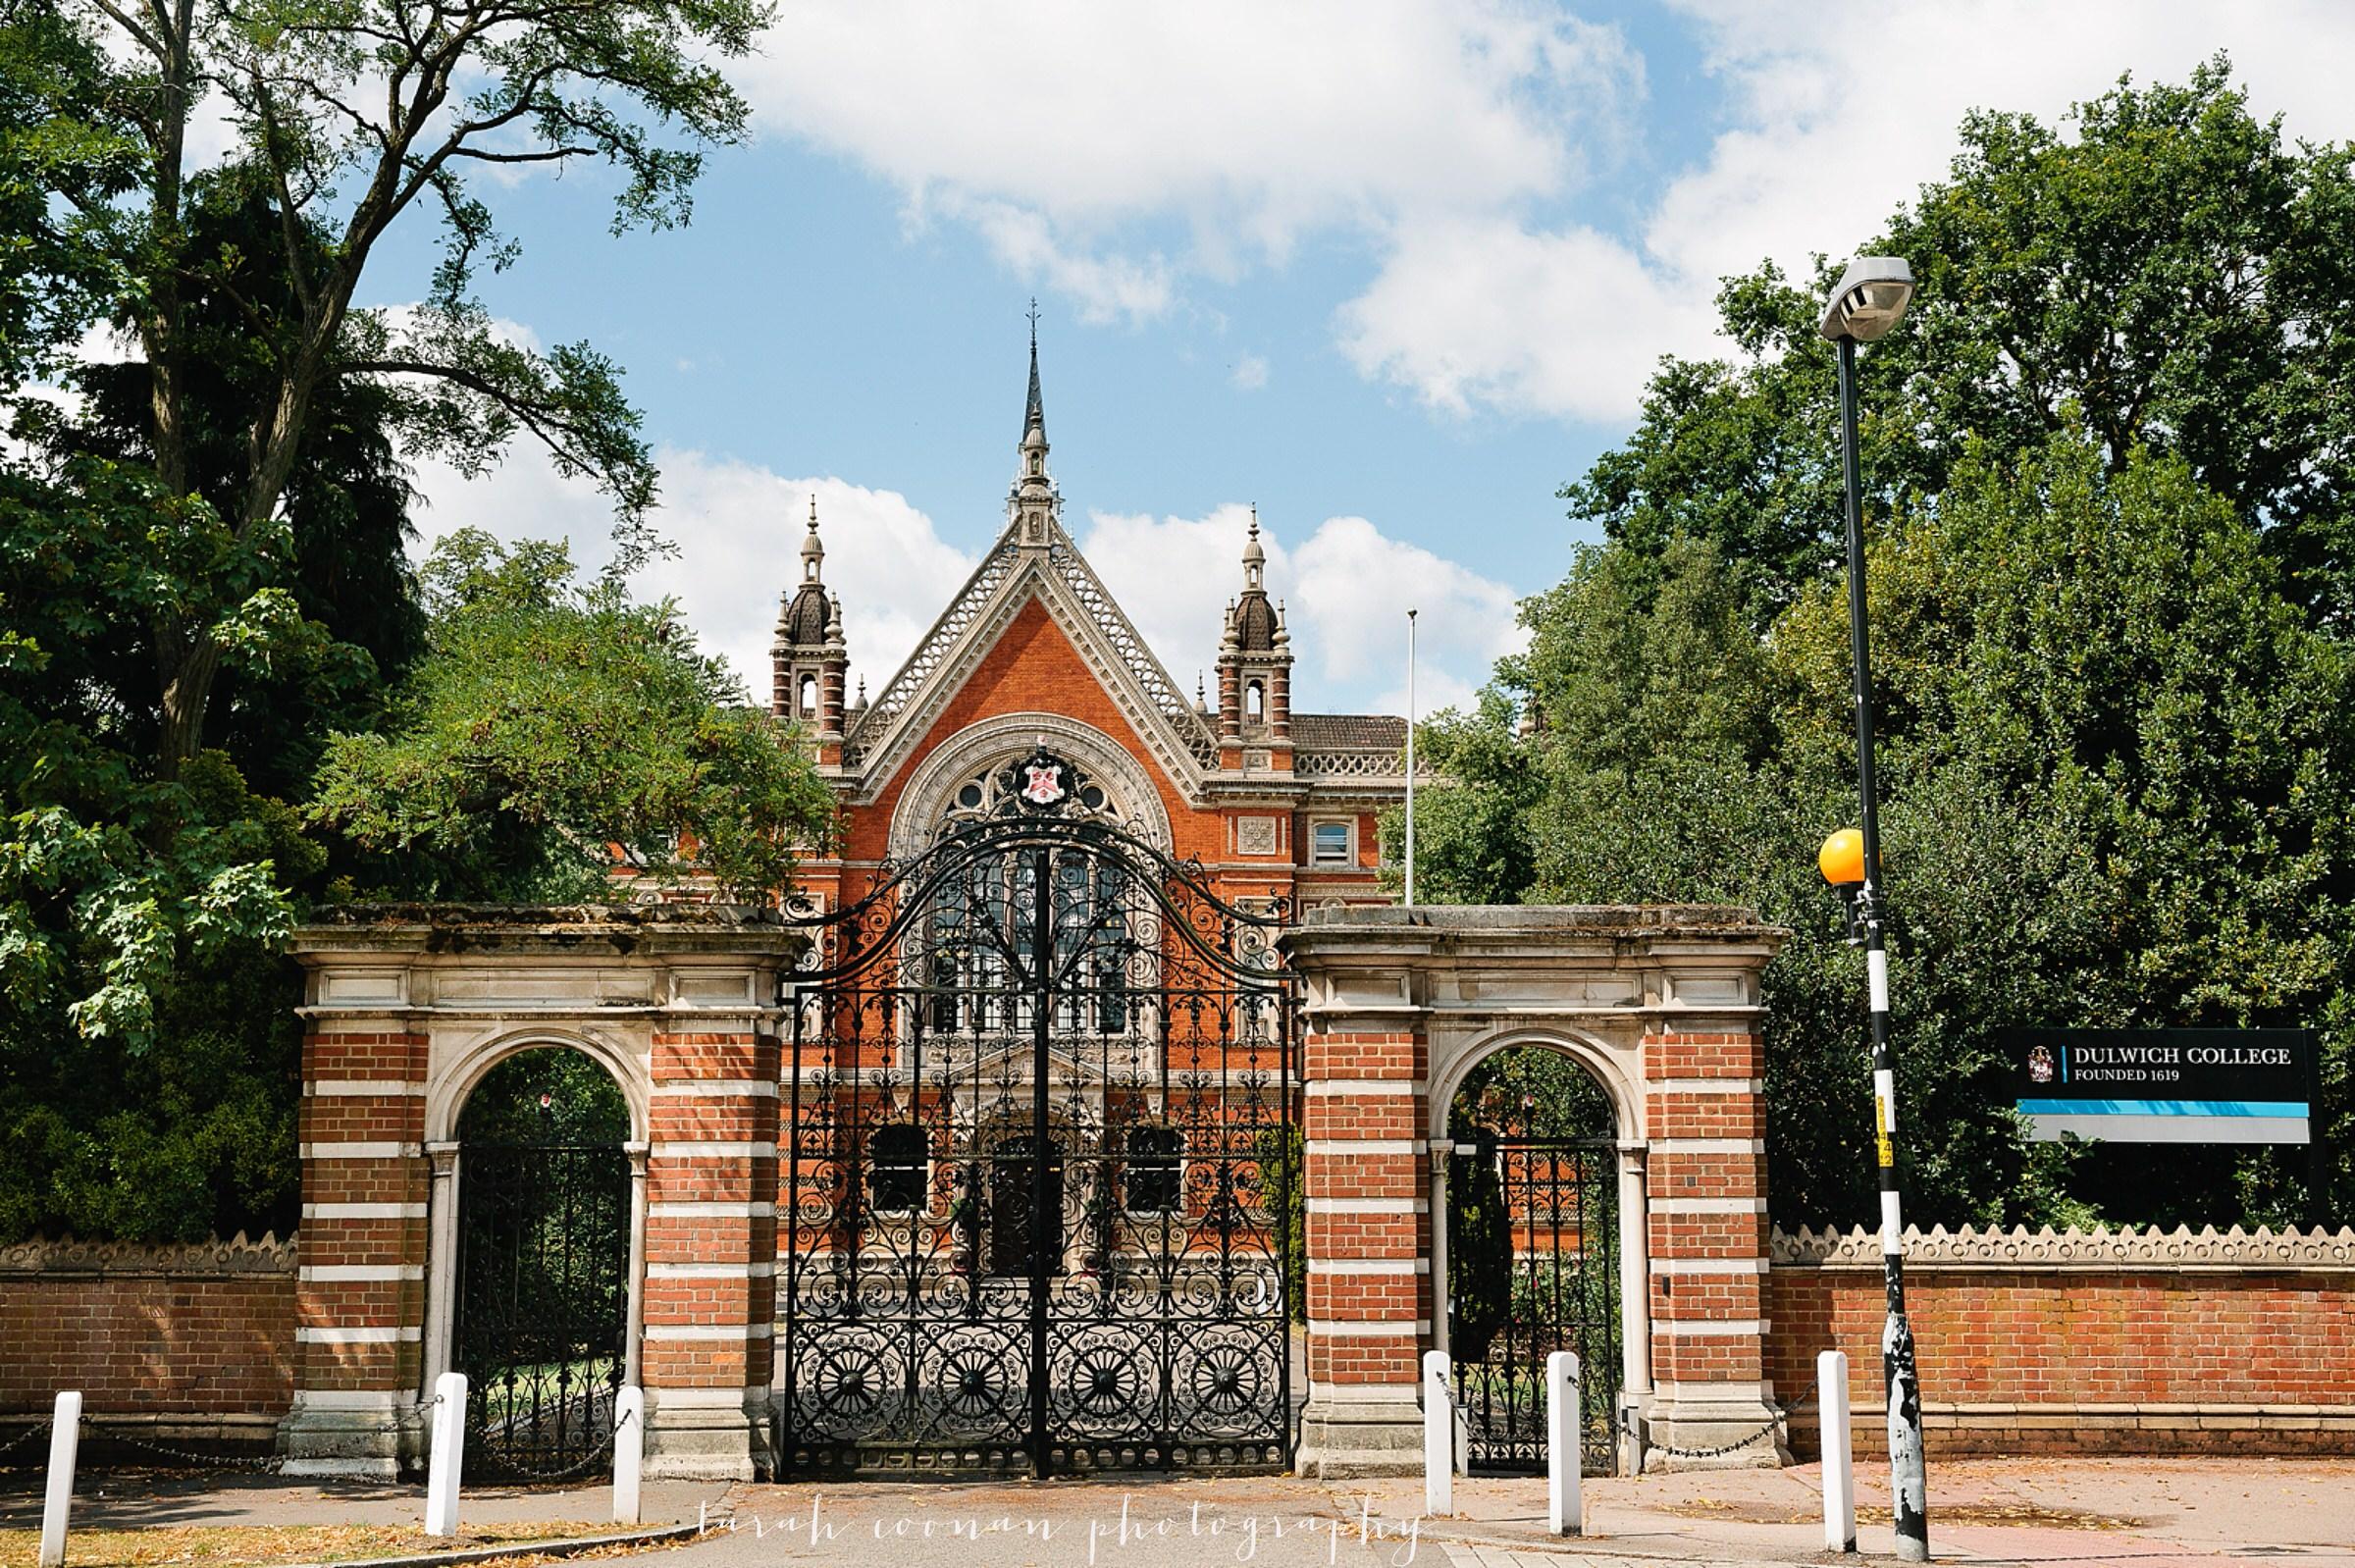 dulwich college school